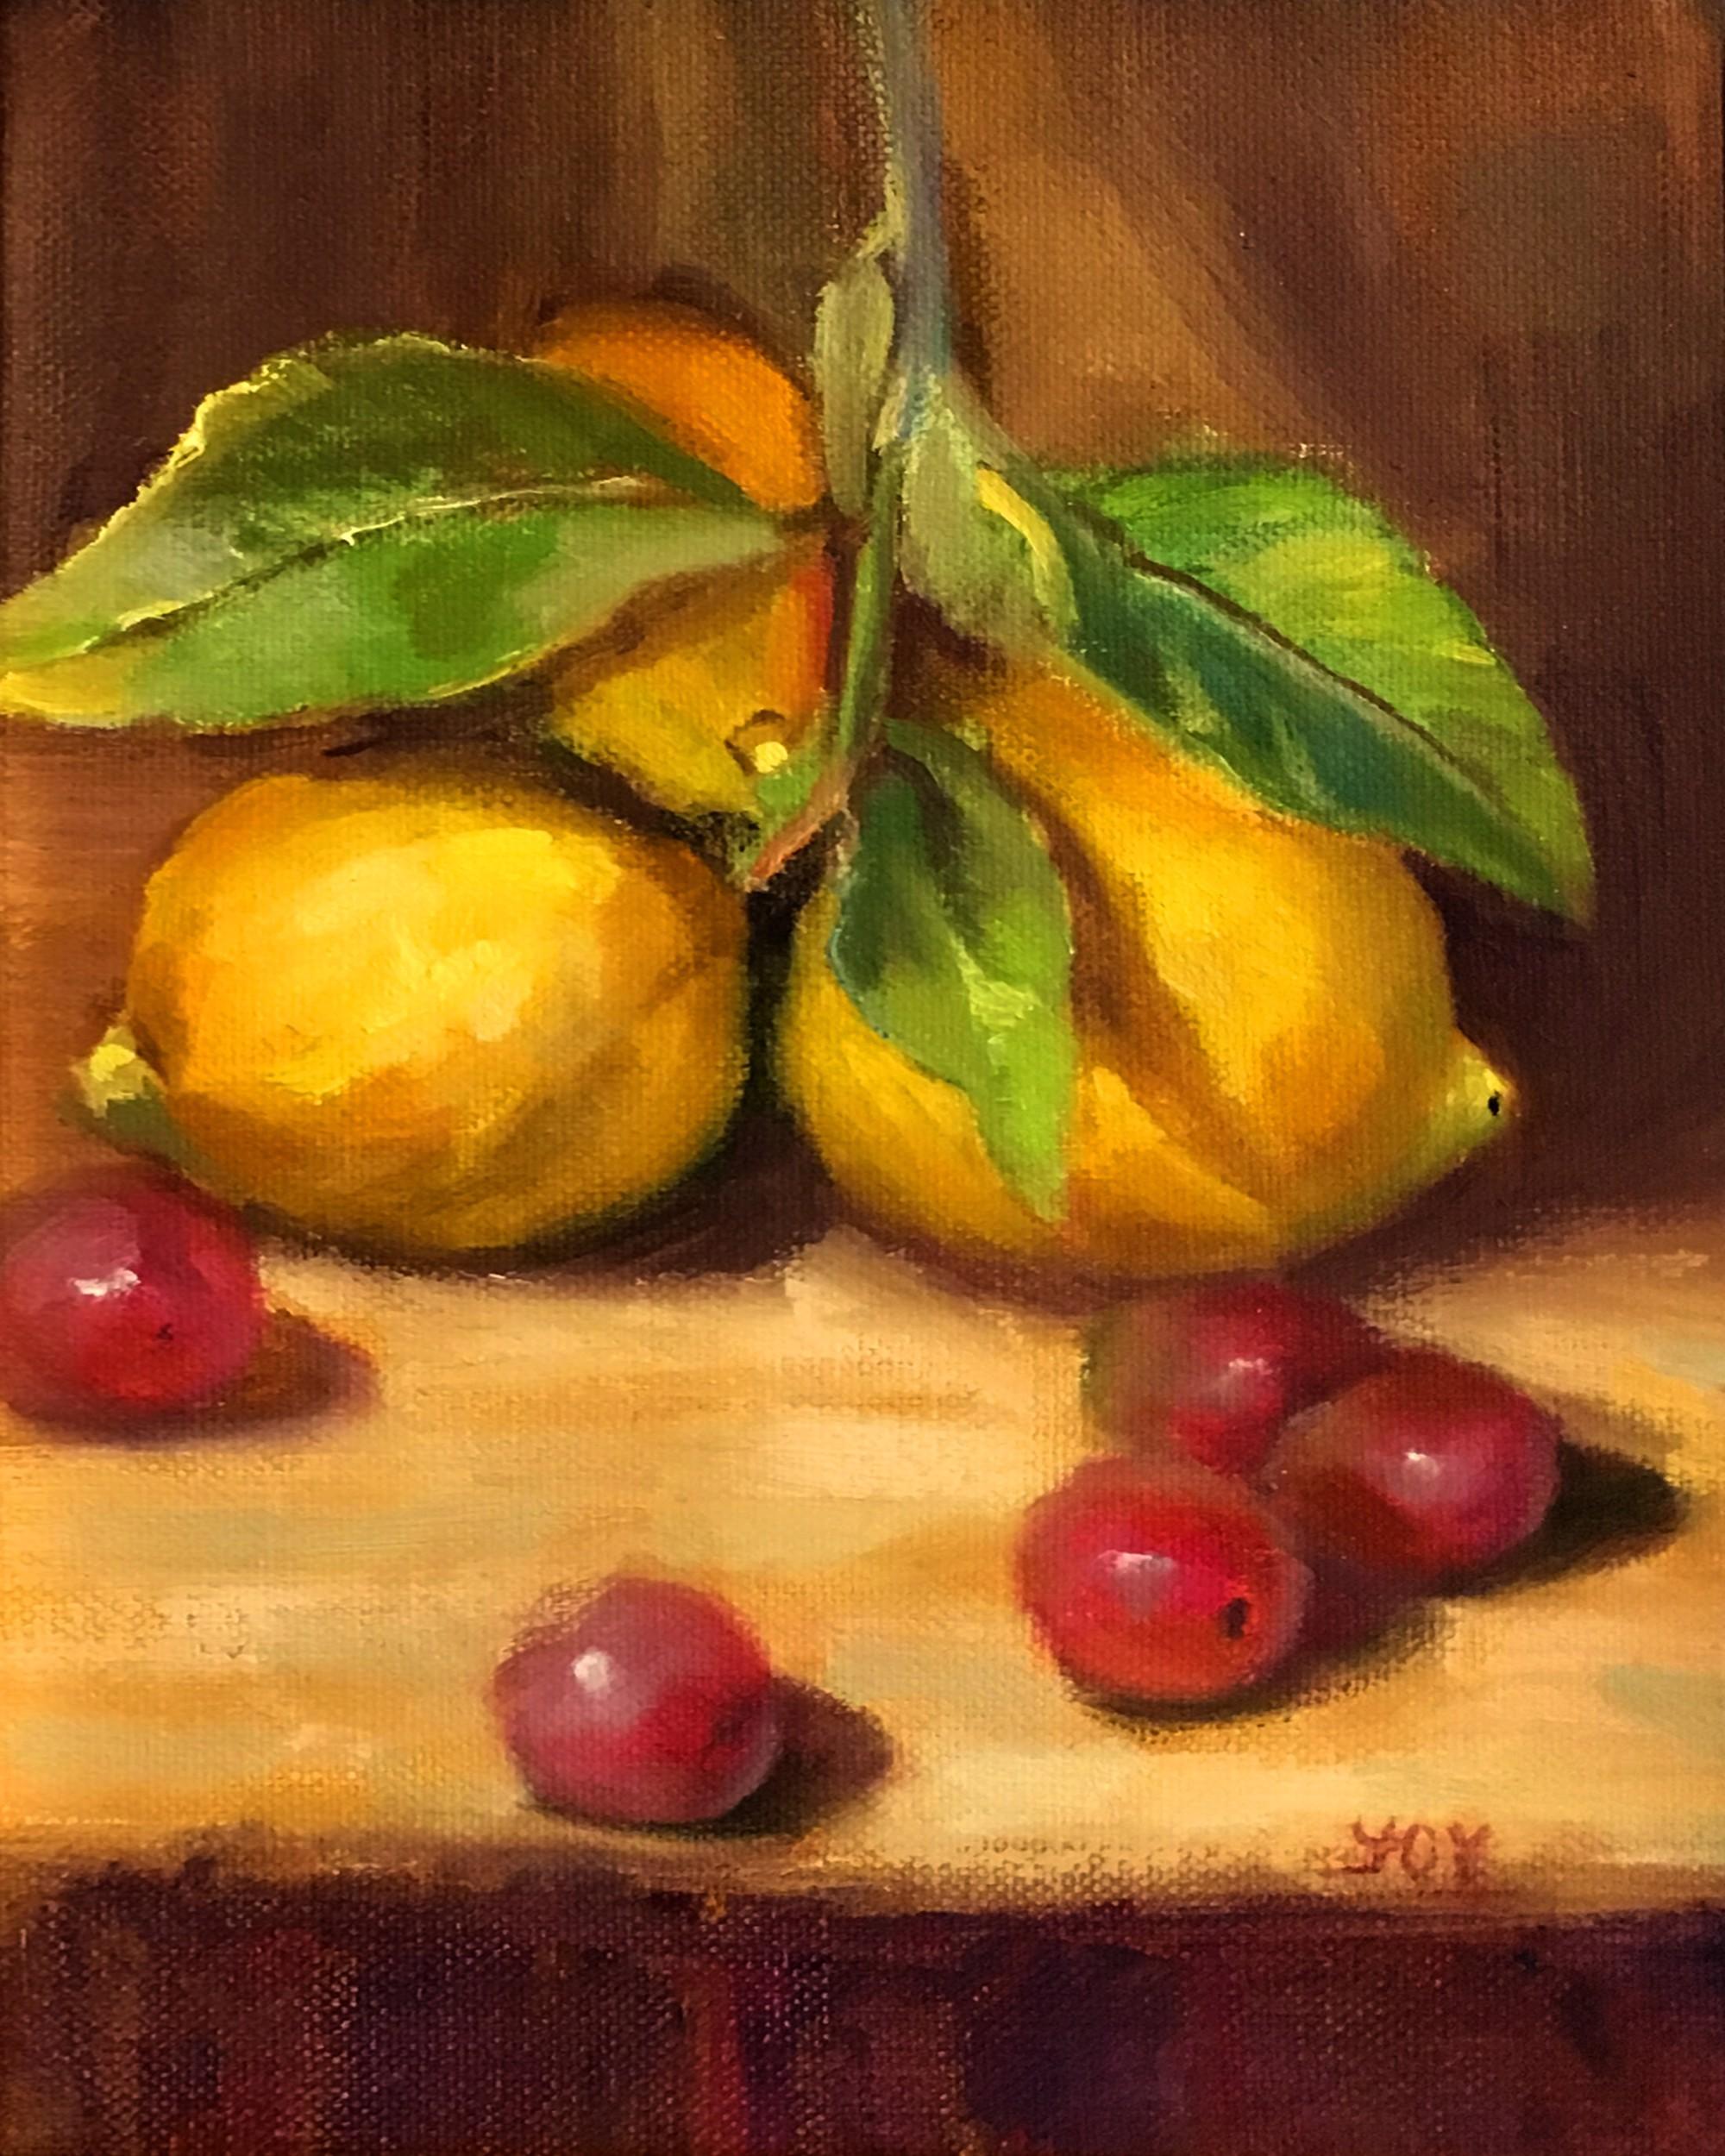 Lemons by JOY